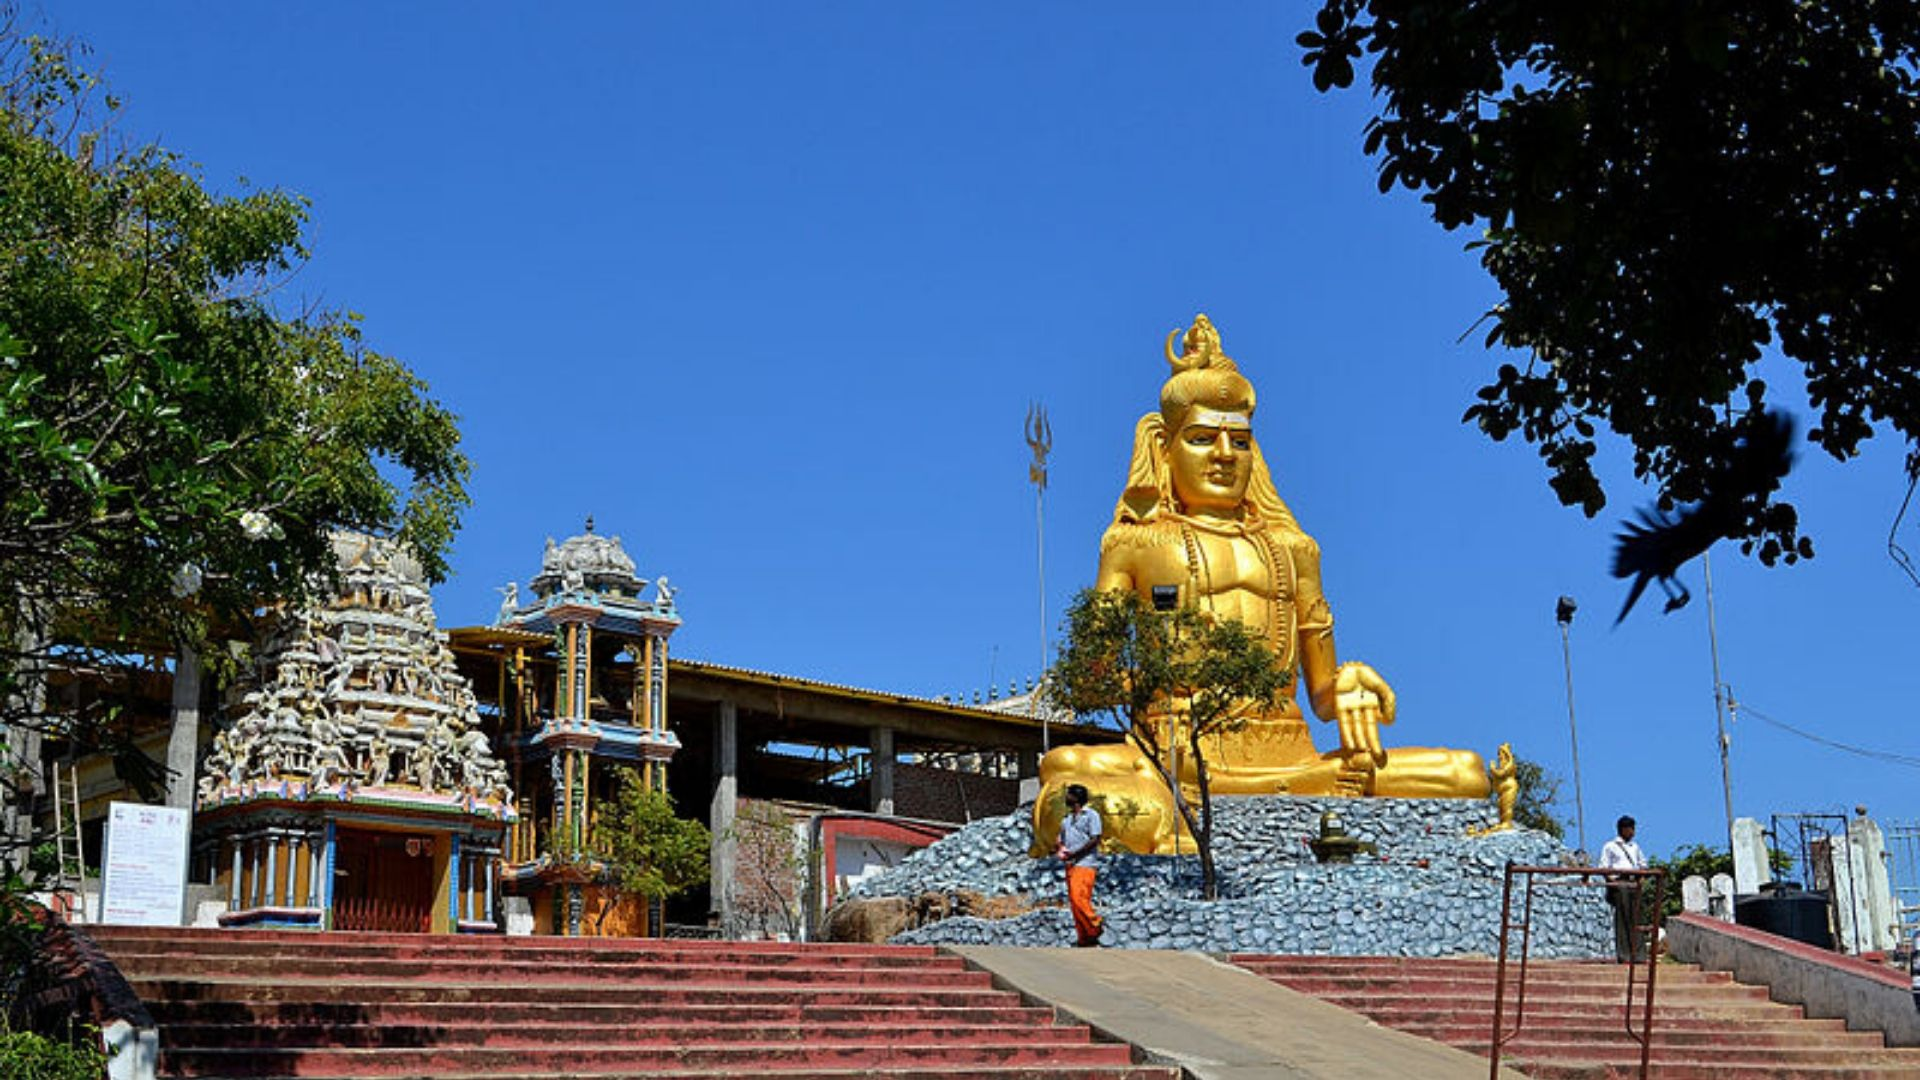 Thiru Koneswaram Temple Trincomalee Sri Lanka